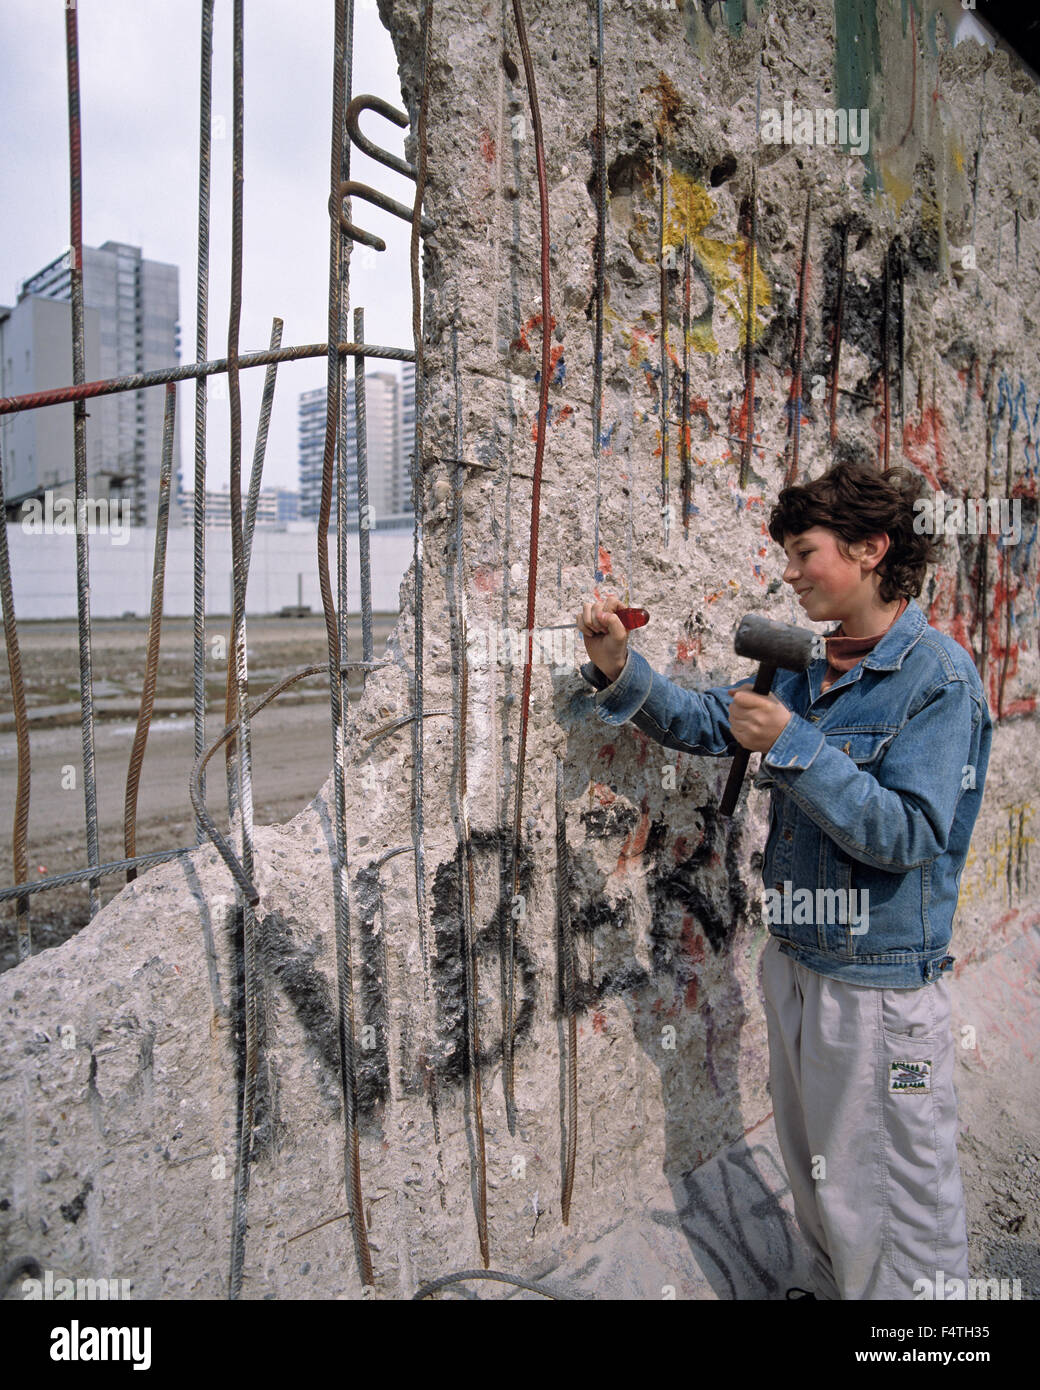 Deutschland, Europa, Berlin, Specht, Frau, Frau, Stein, Souvenir, Eröffnung, Berliner Mauer, Berlin-West, Ost Stockbild